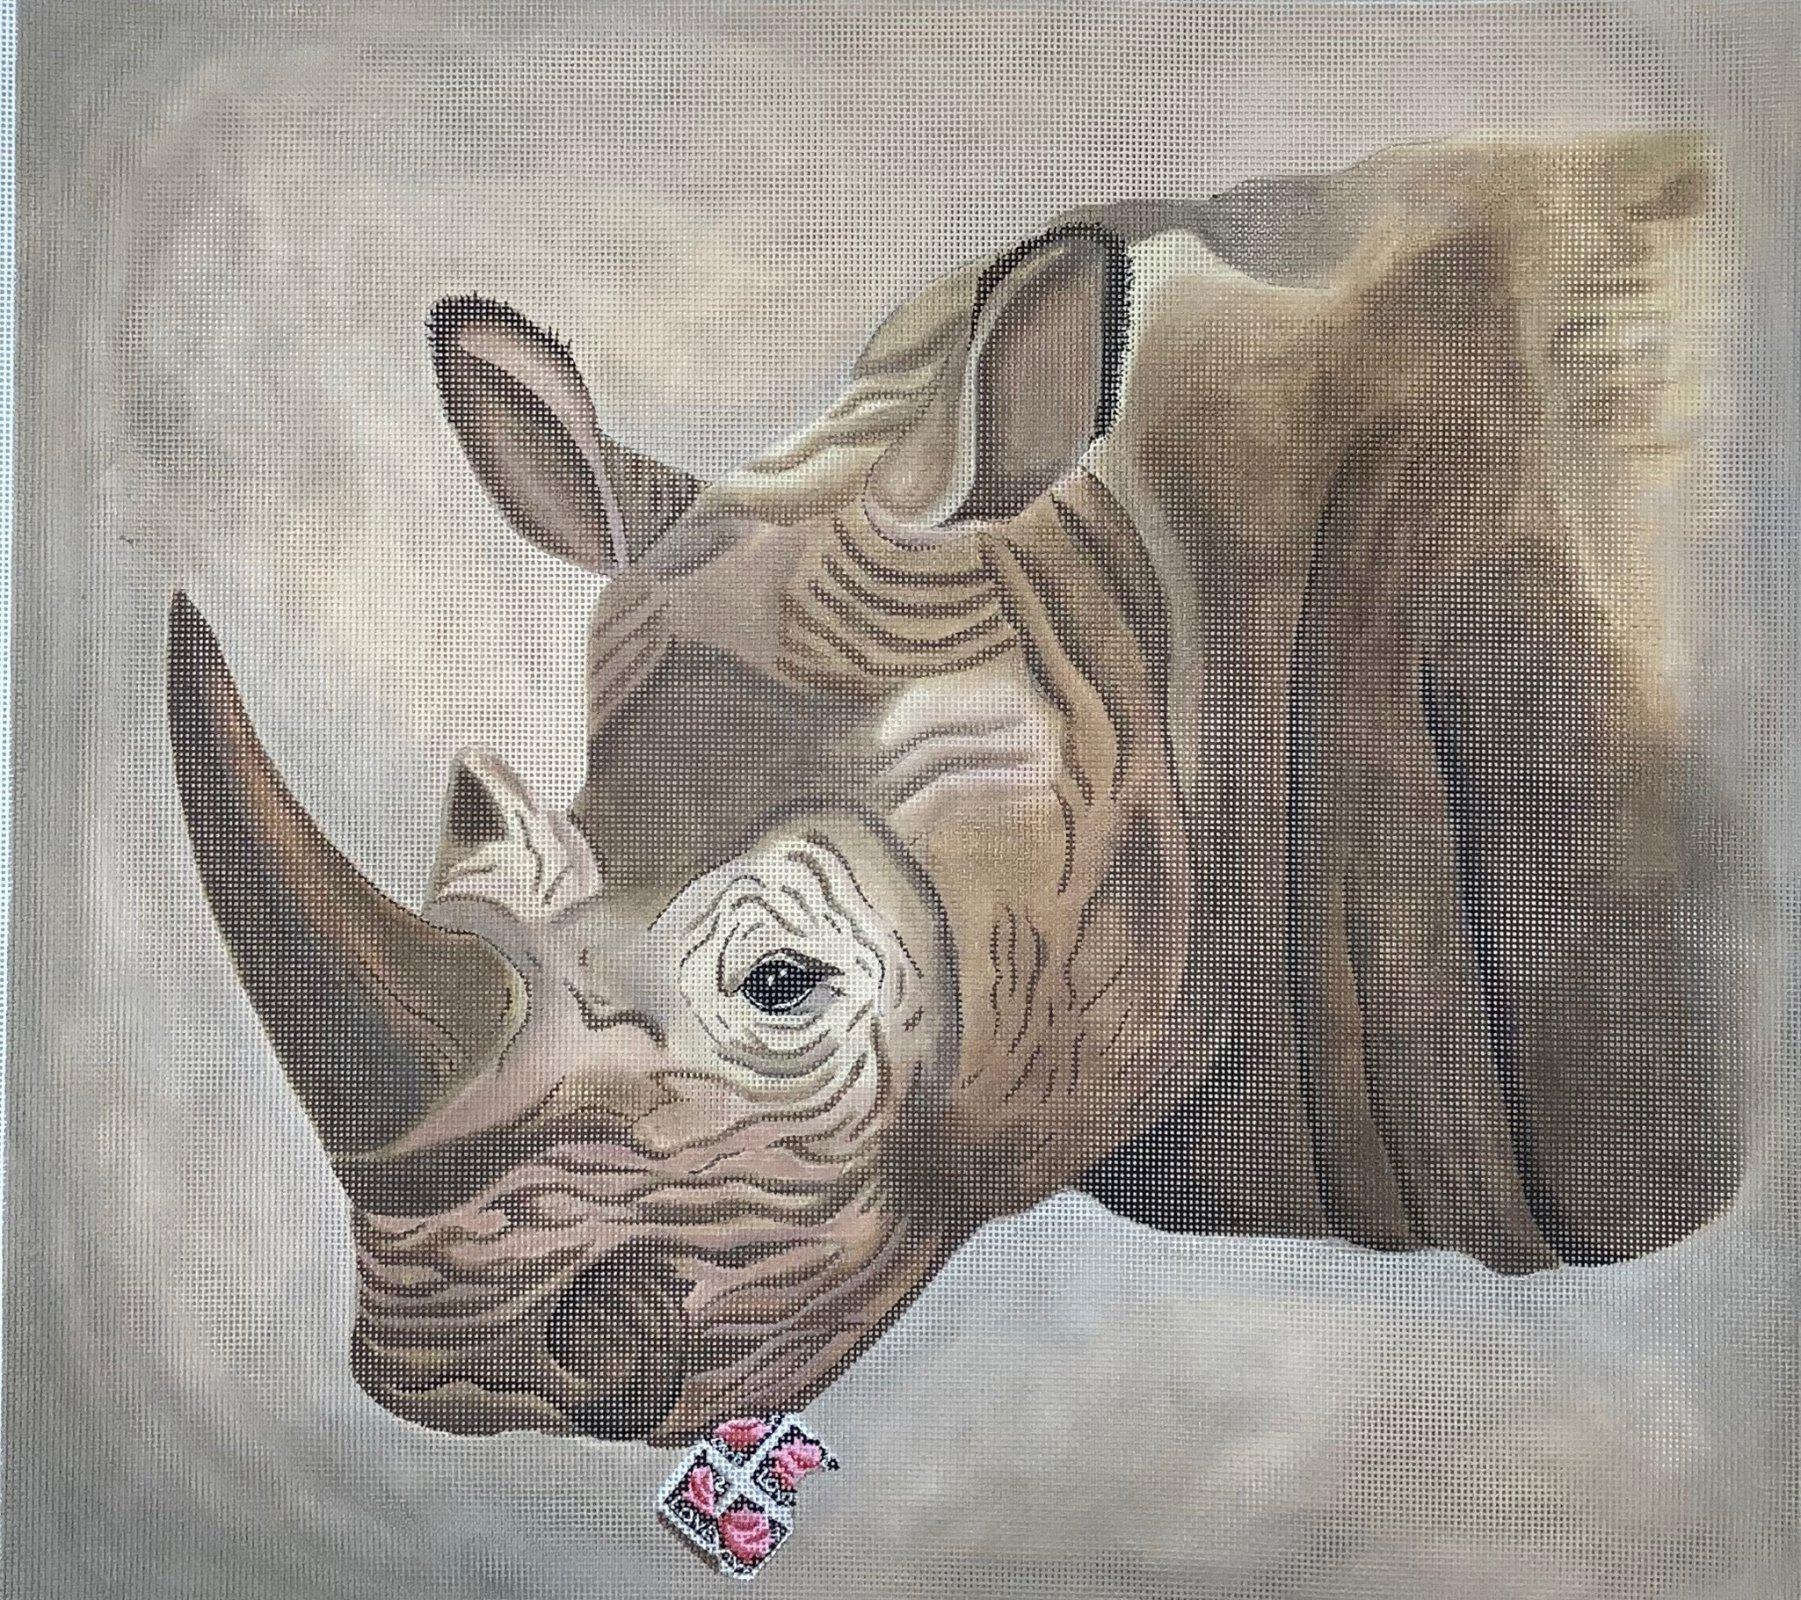 ZDBB Stamp-Eat Rhino Zoo-Illogical